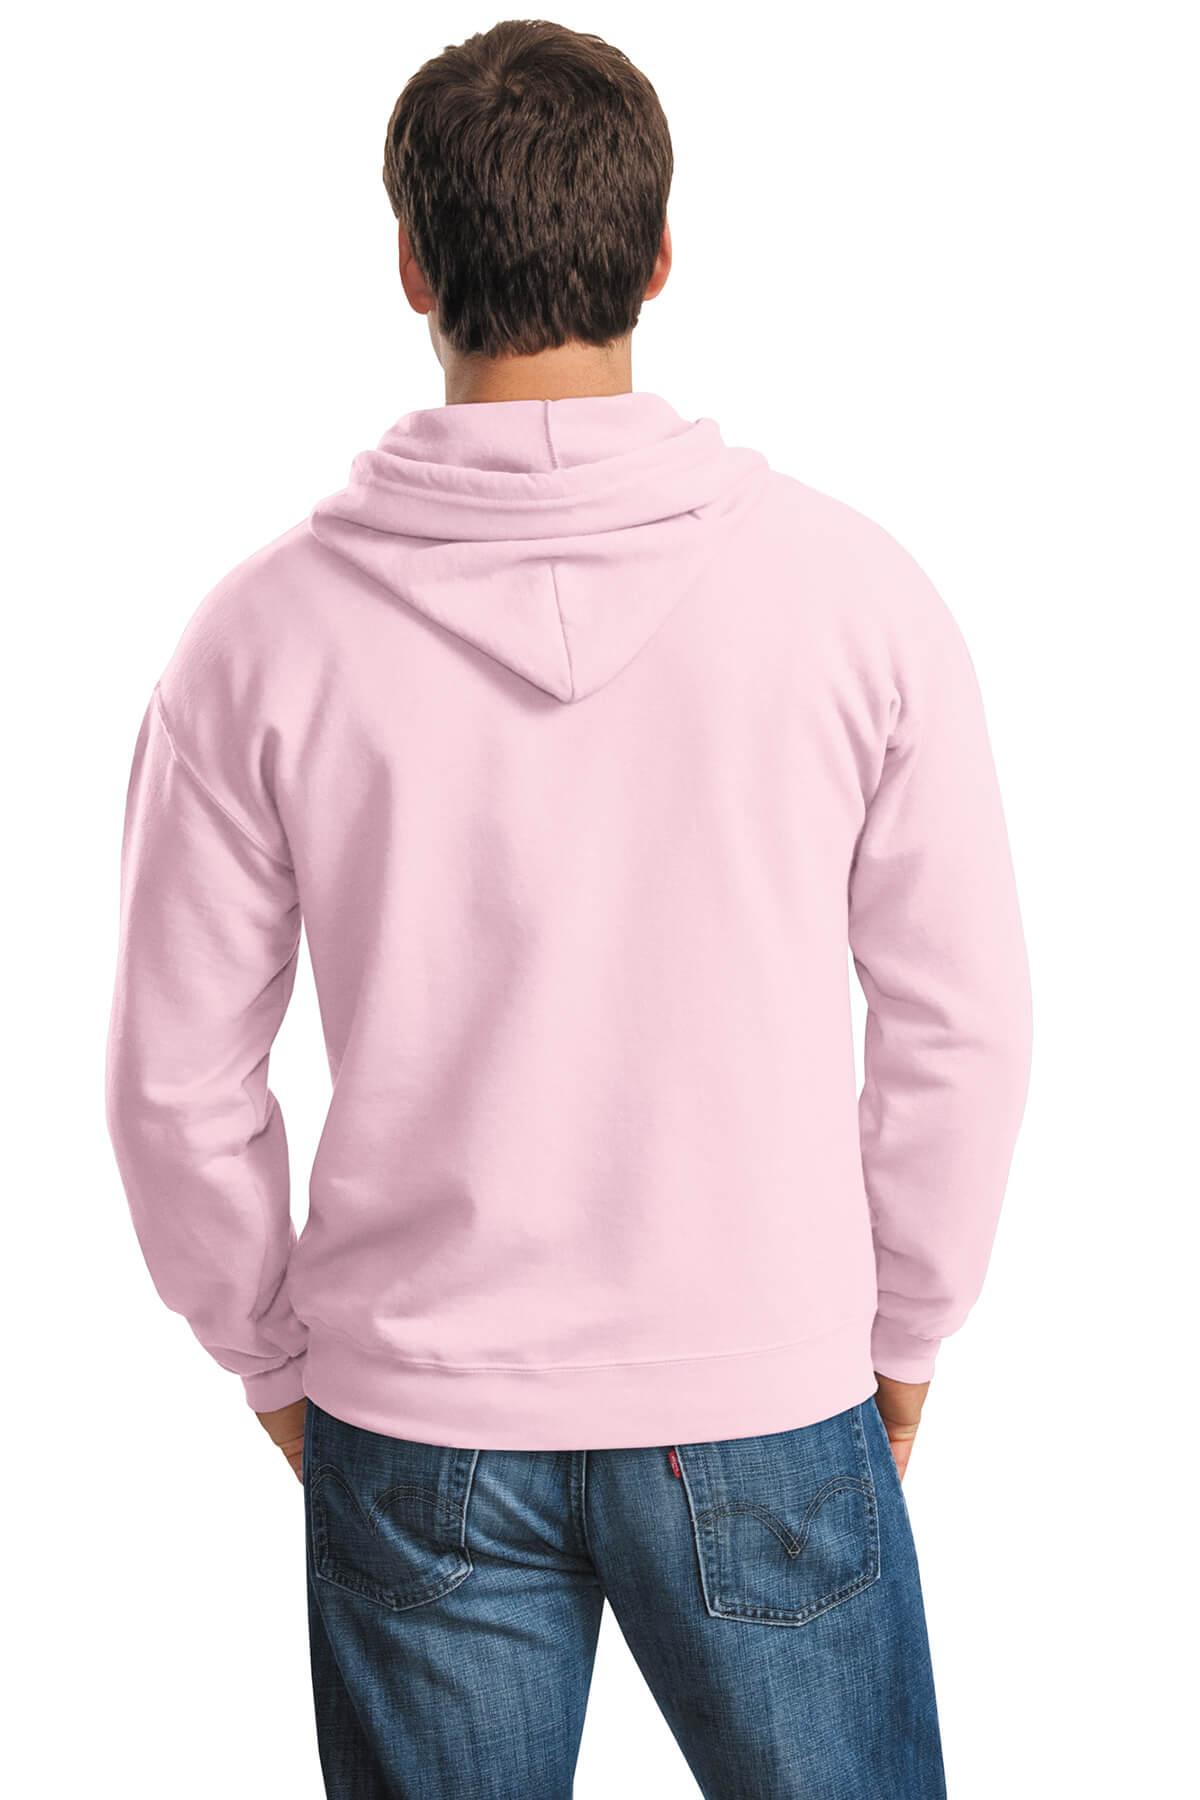 18600-light-pink-2